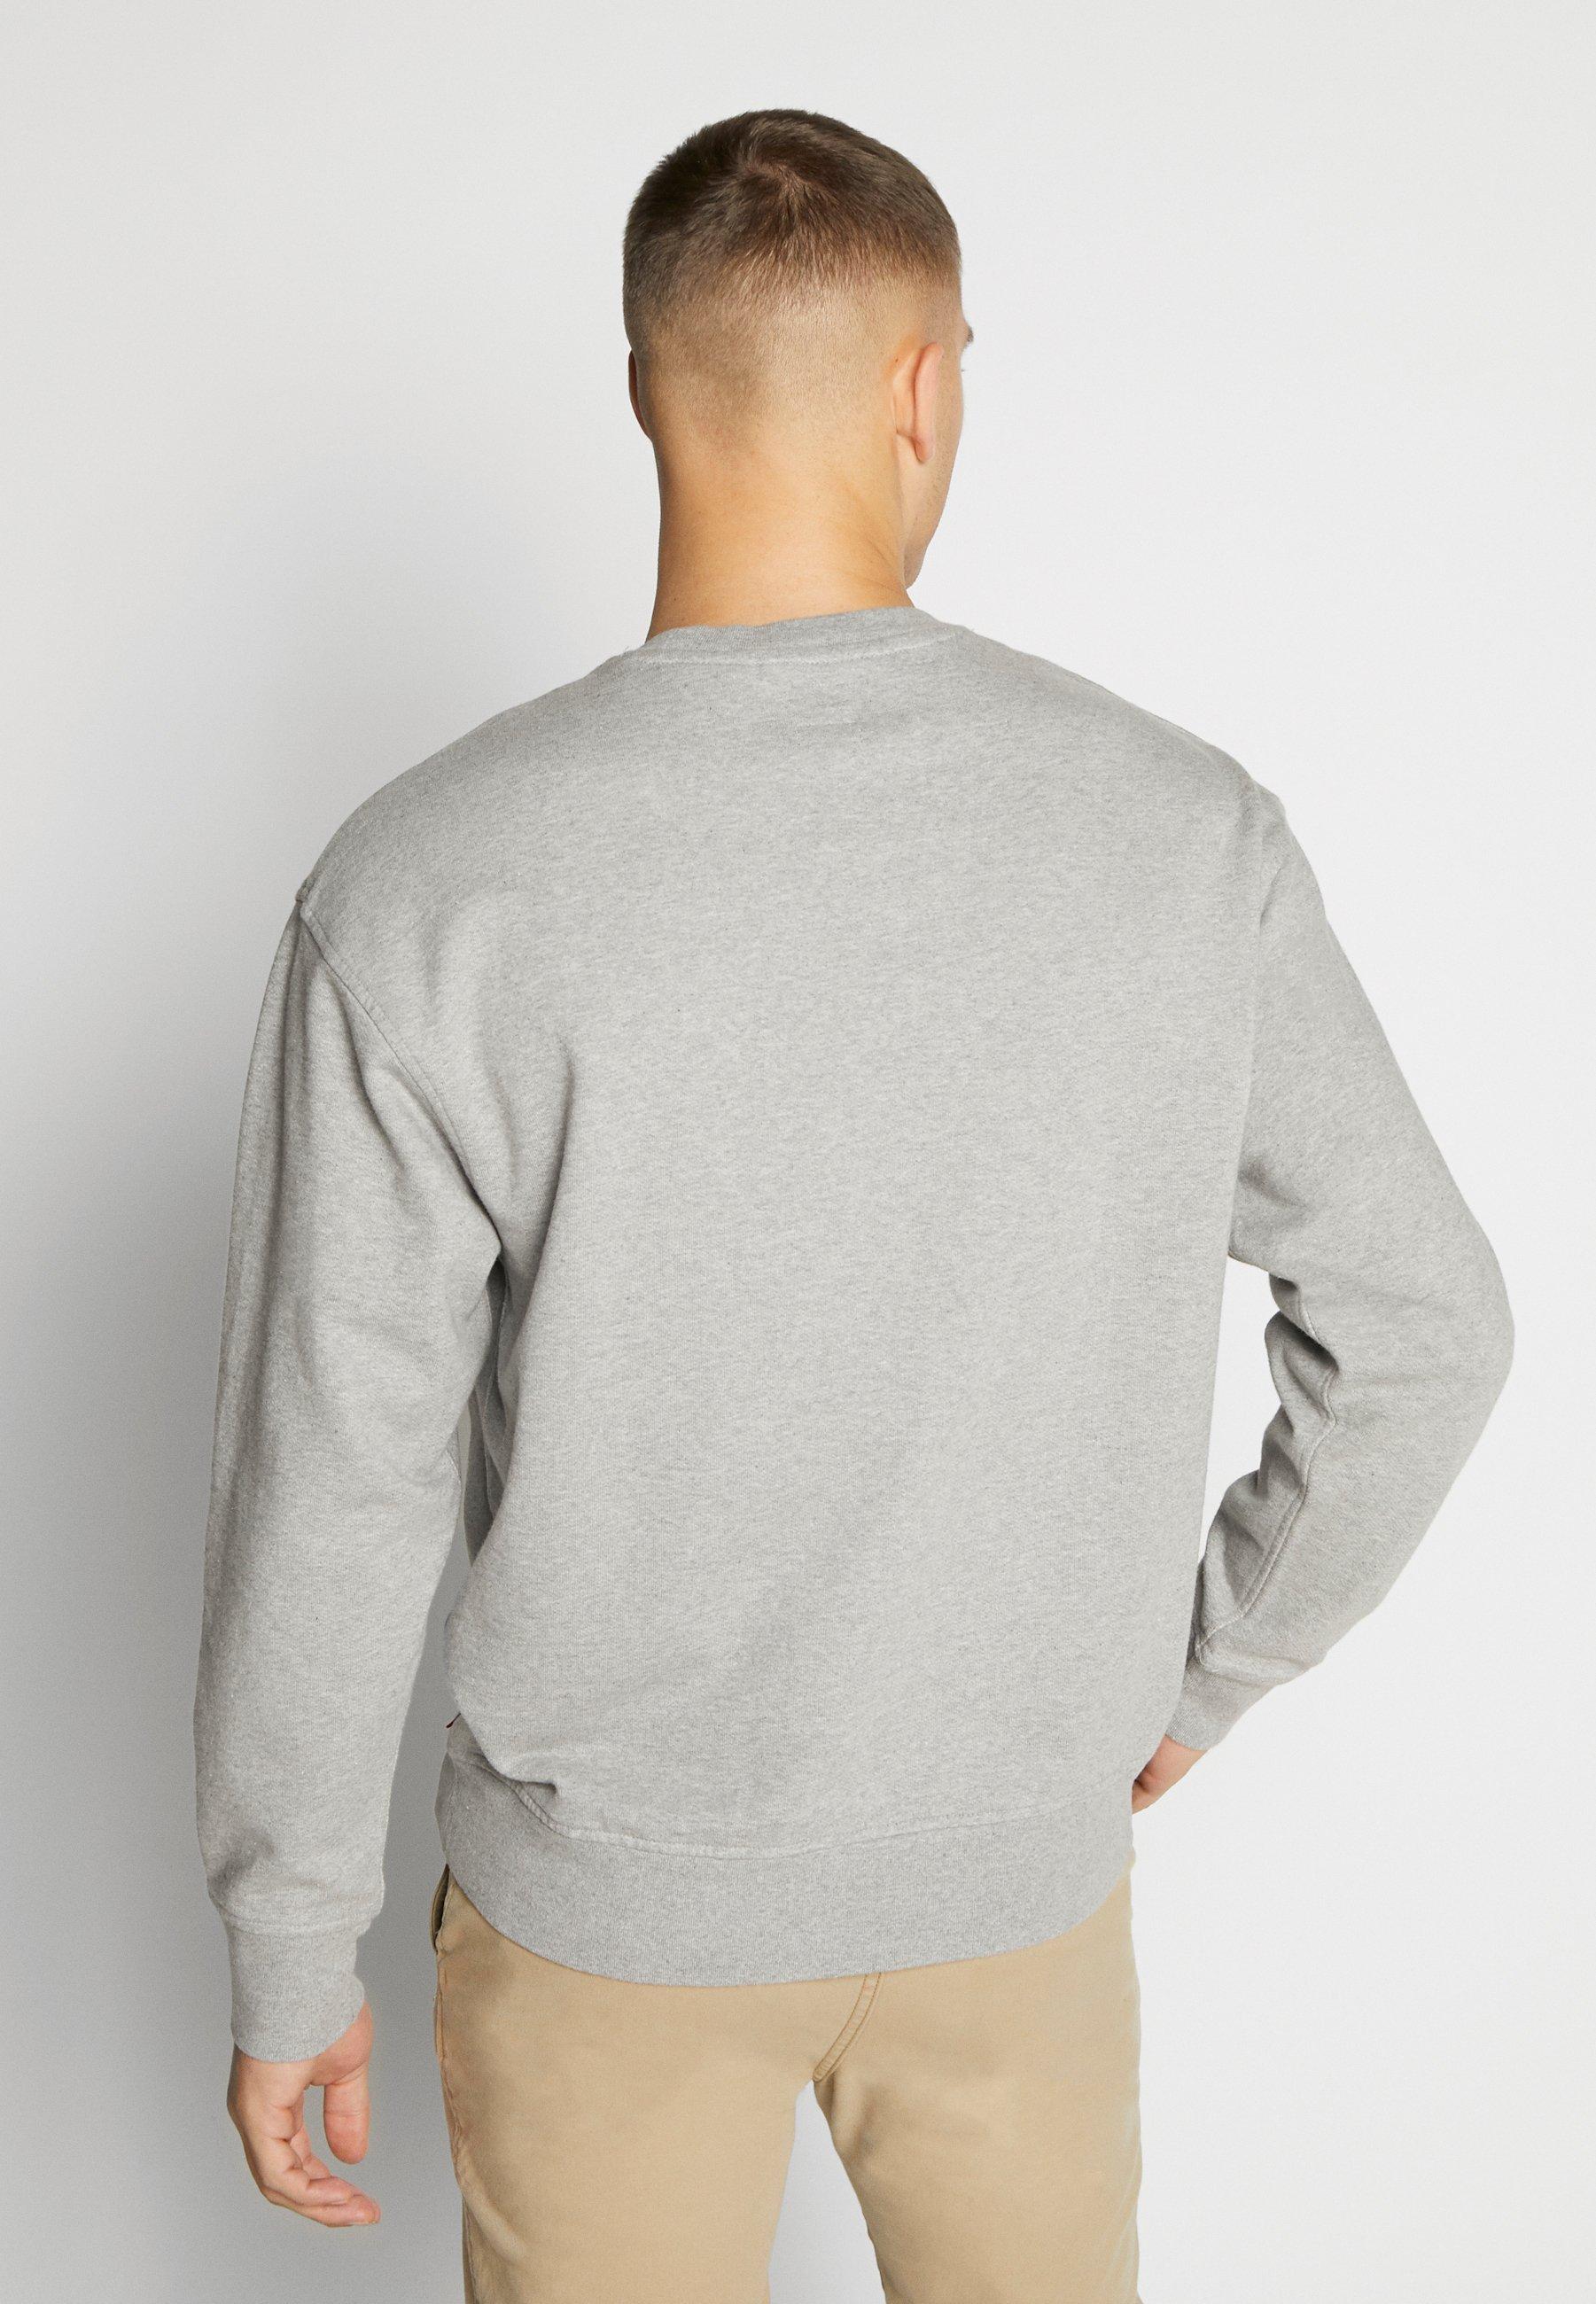 2020 Alennus Miesten vaatteet Sarja dfKJIUp97454sfGHYHD Levi's® RELAXED GRAPHIC CREWNECK Collegepaita mottled grey